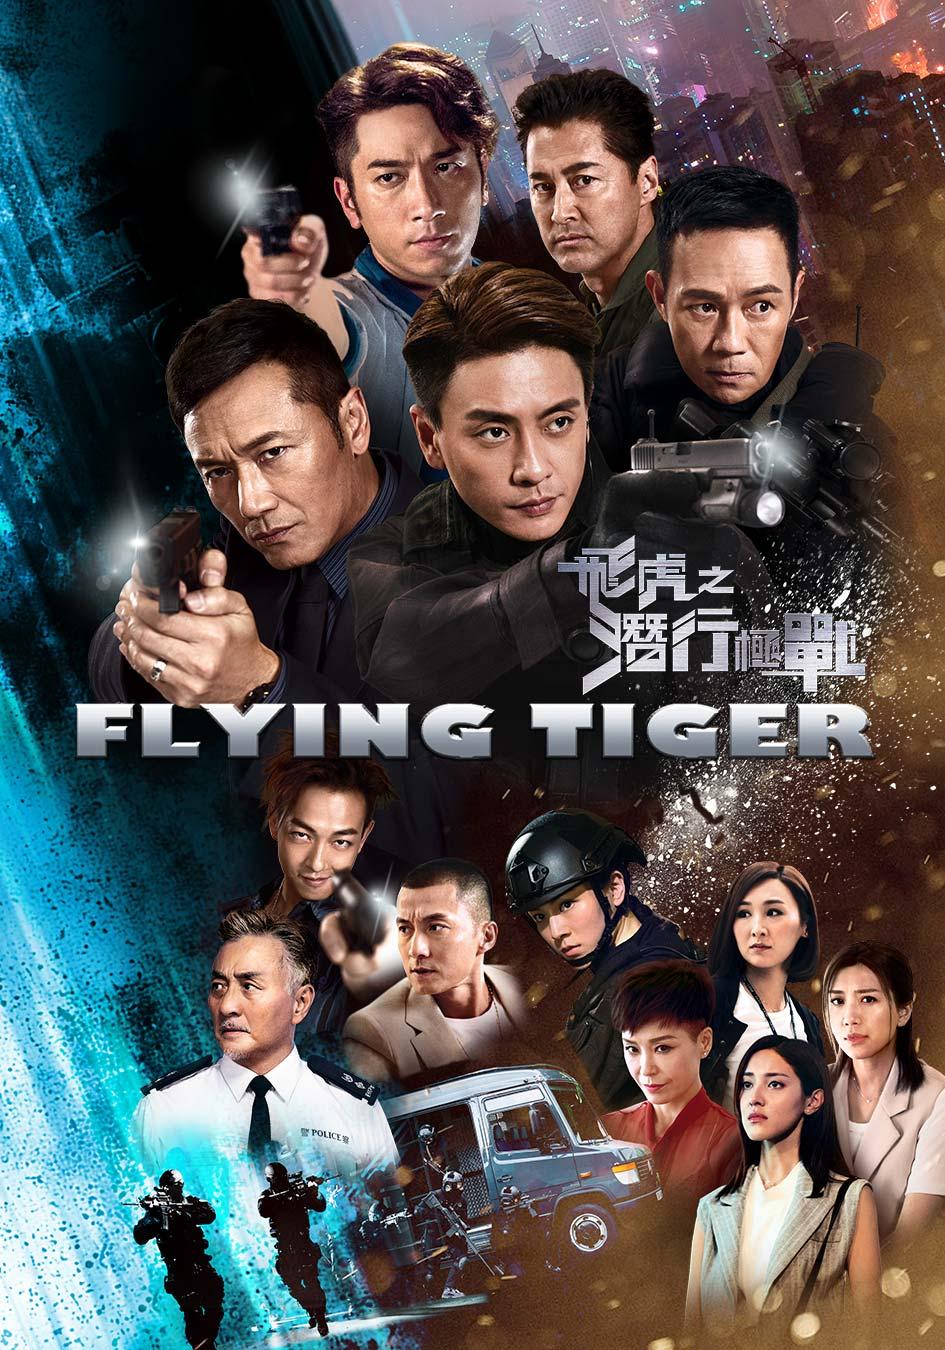 Flying Tiger-Flying Tiger